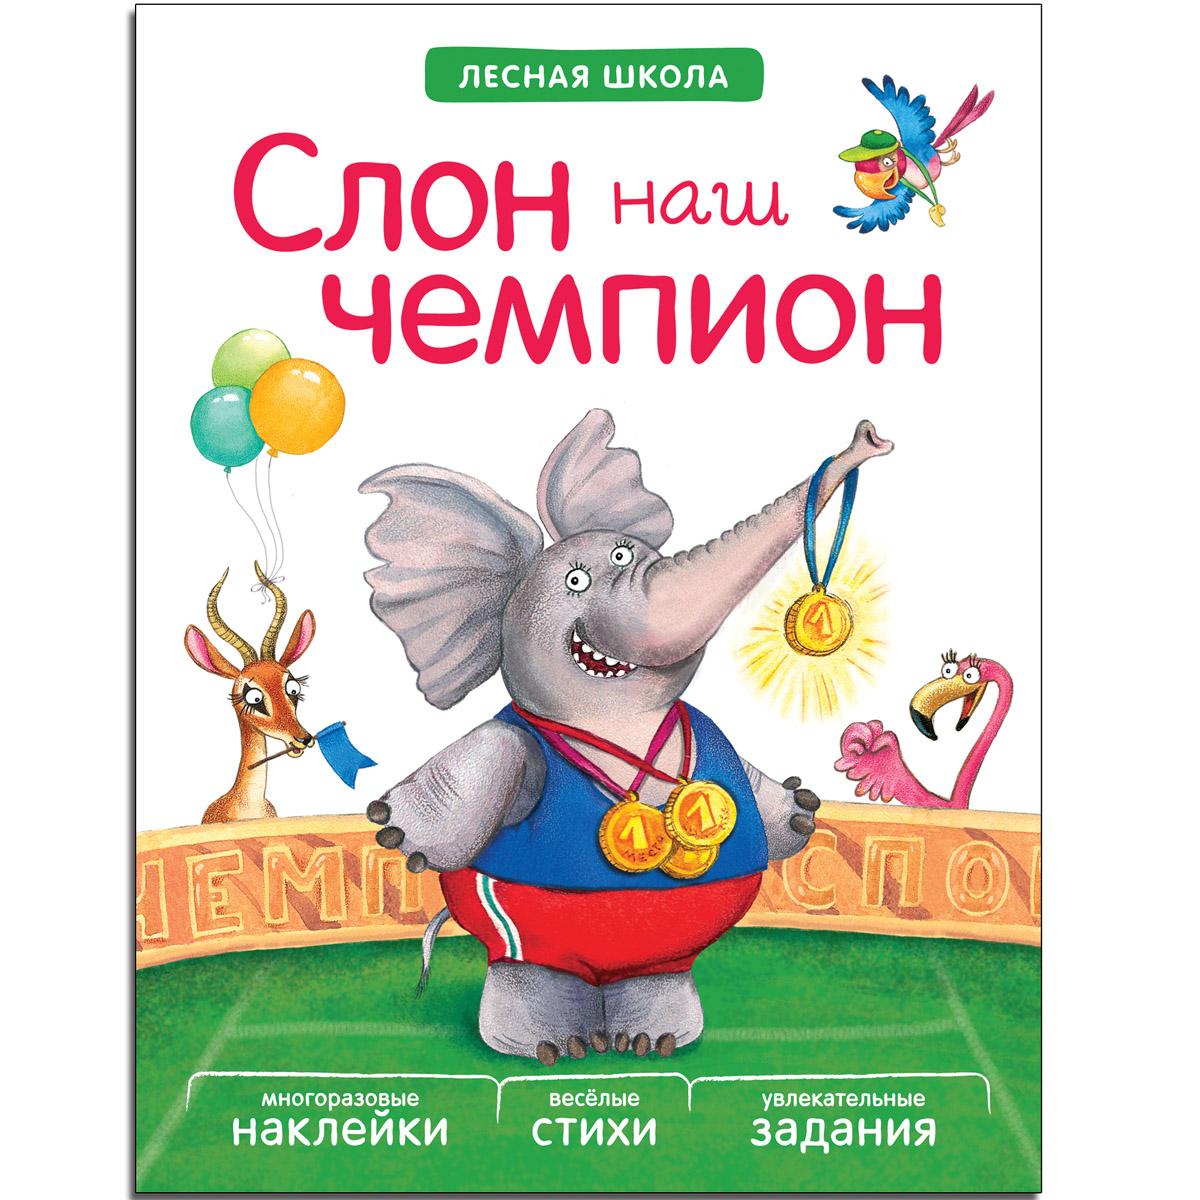 Книга Мозаика-синтез Лесная школа Слон наш чемпион<br>